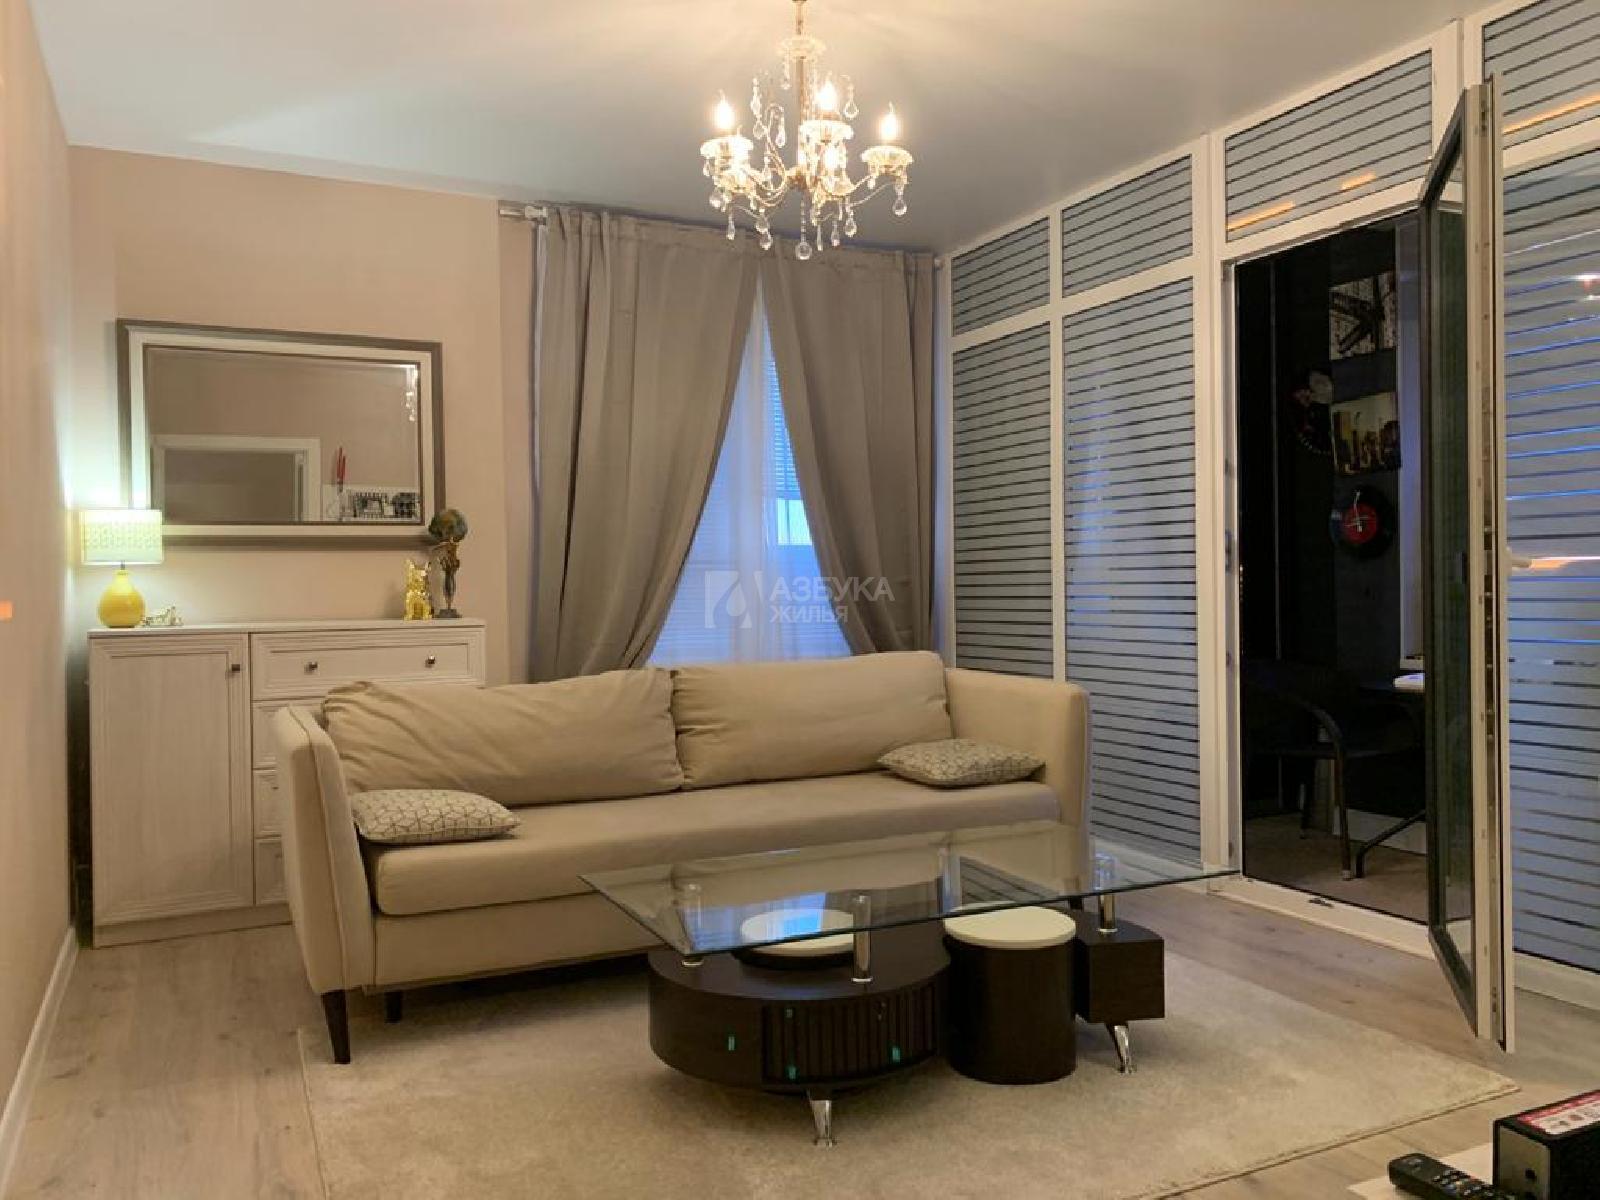 Фото №15 - 3-комнатная квартира, Москва, Поляны улица 5, метро Улица Скобелевская